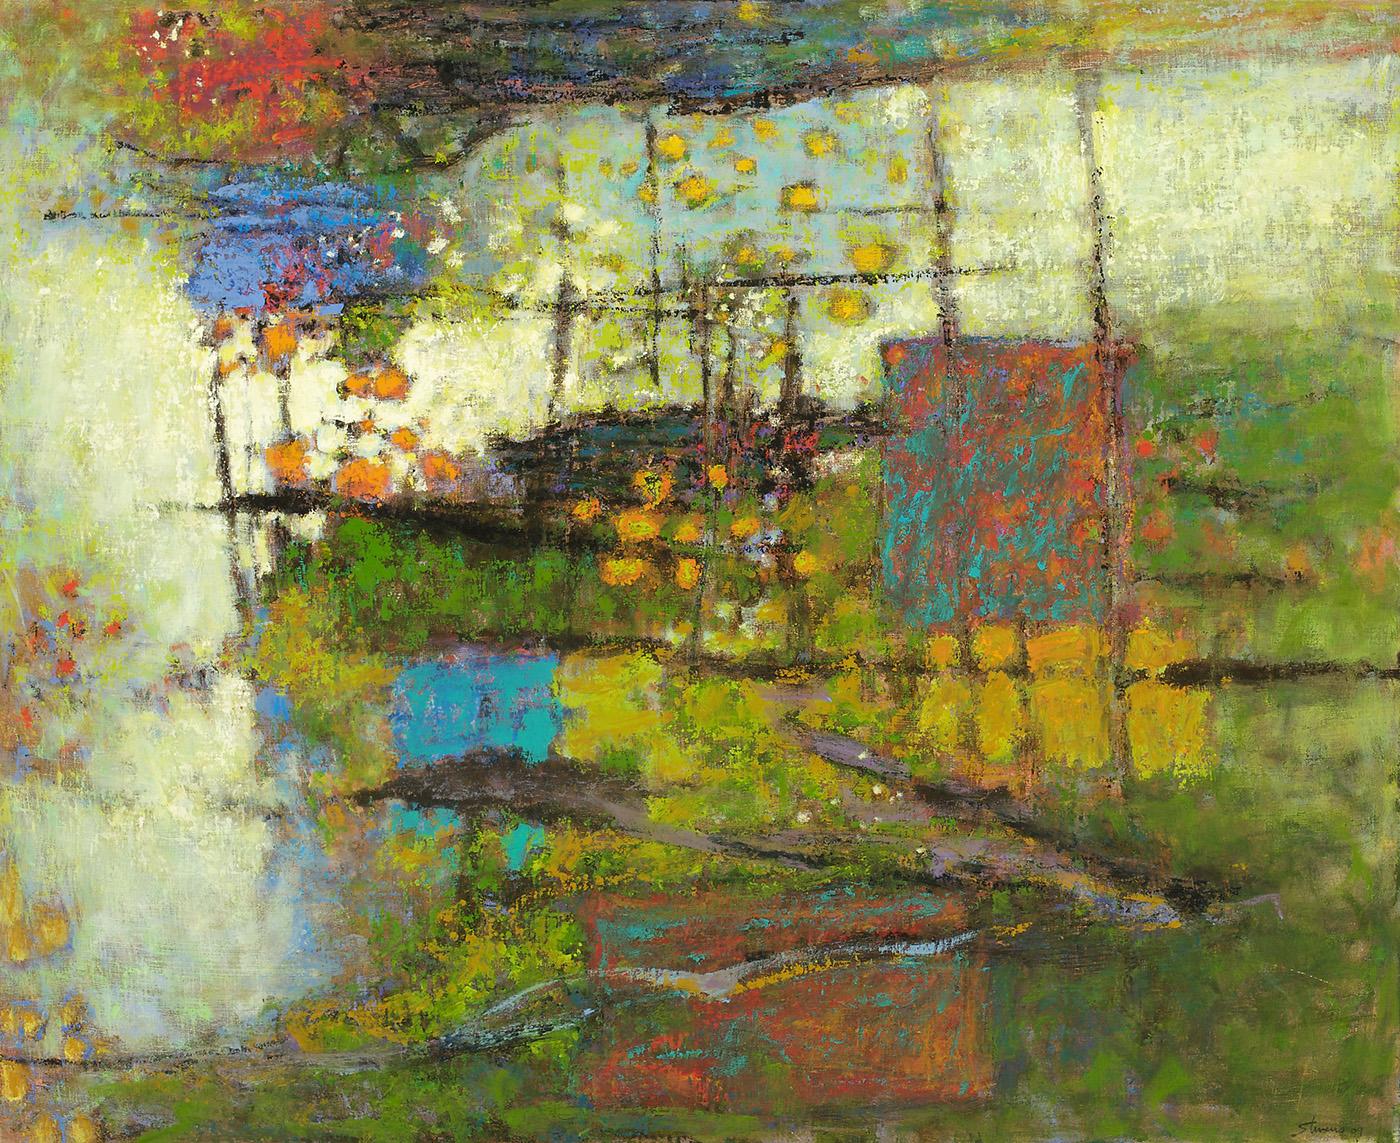 "Wilderness   | oil on linen | 36 x 44"" | 2009"